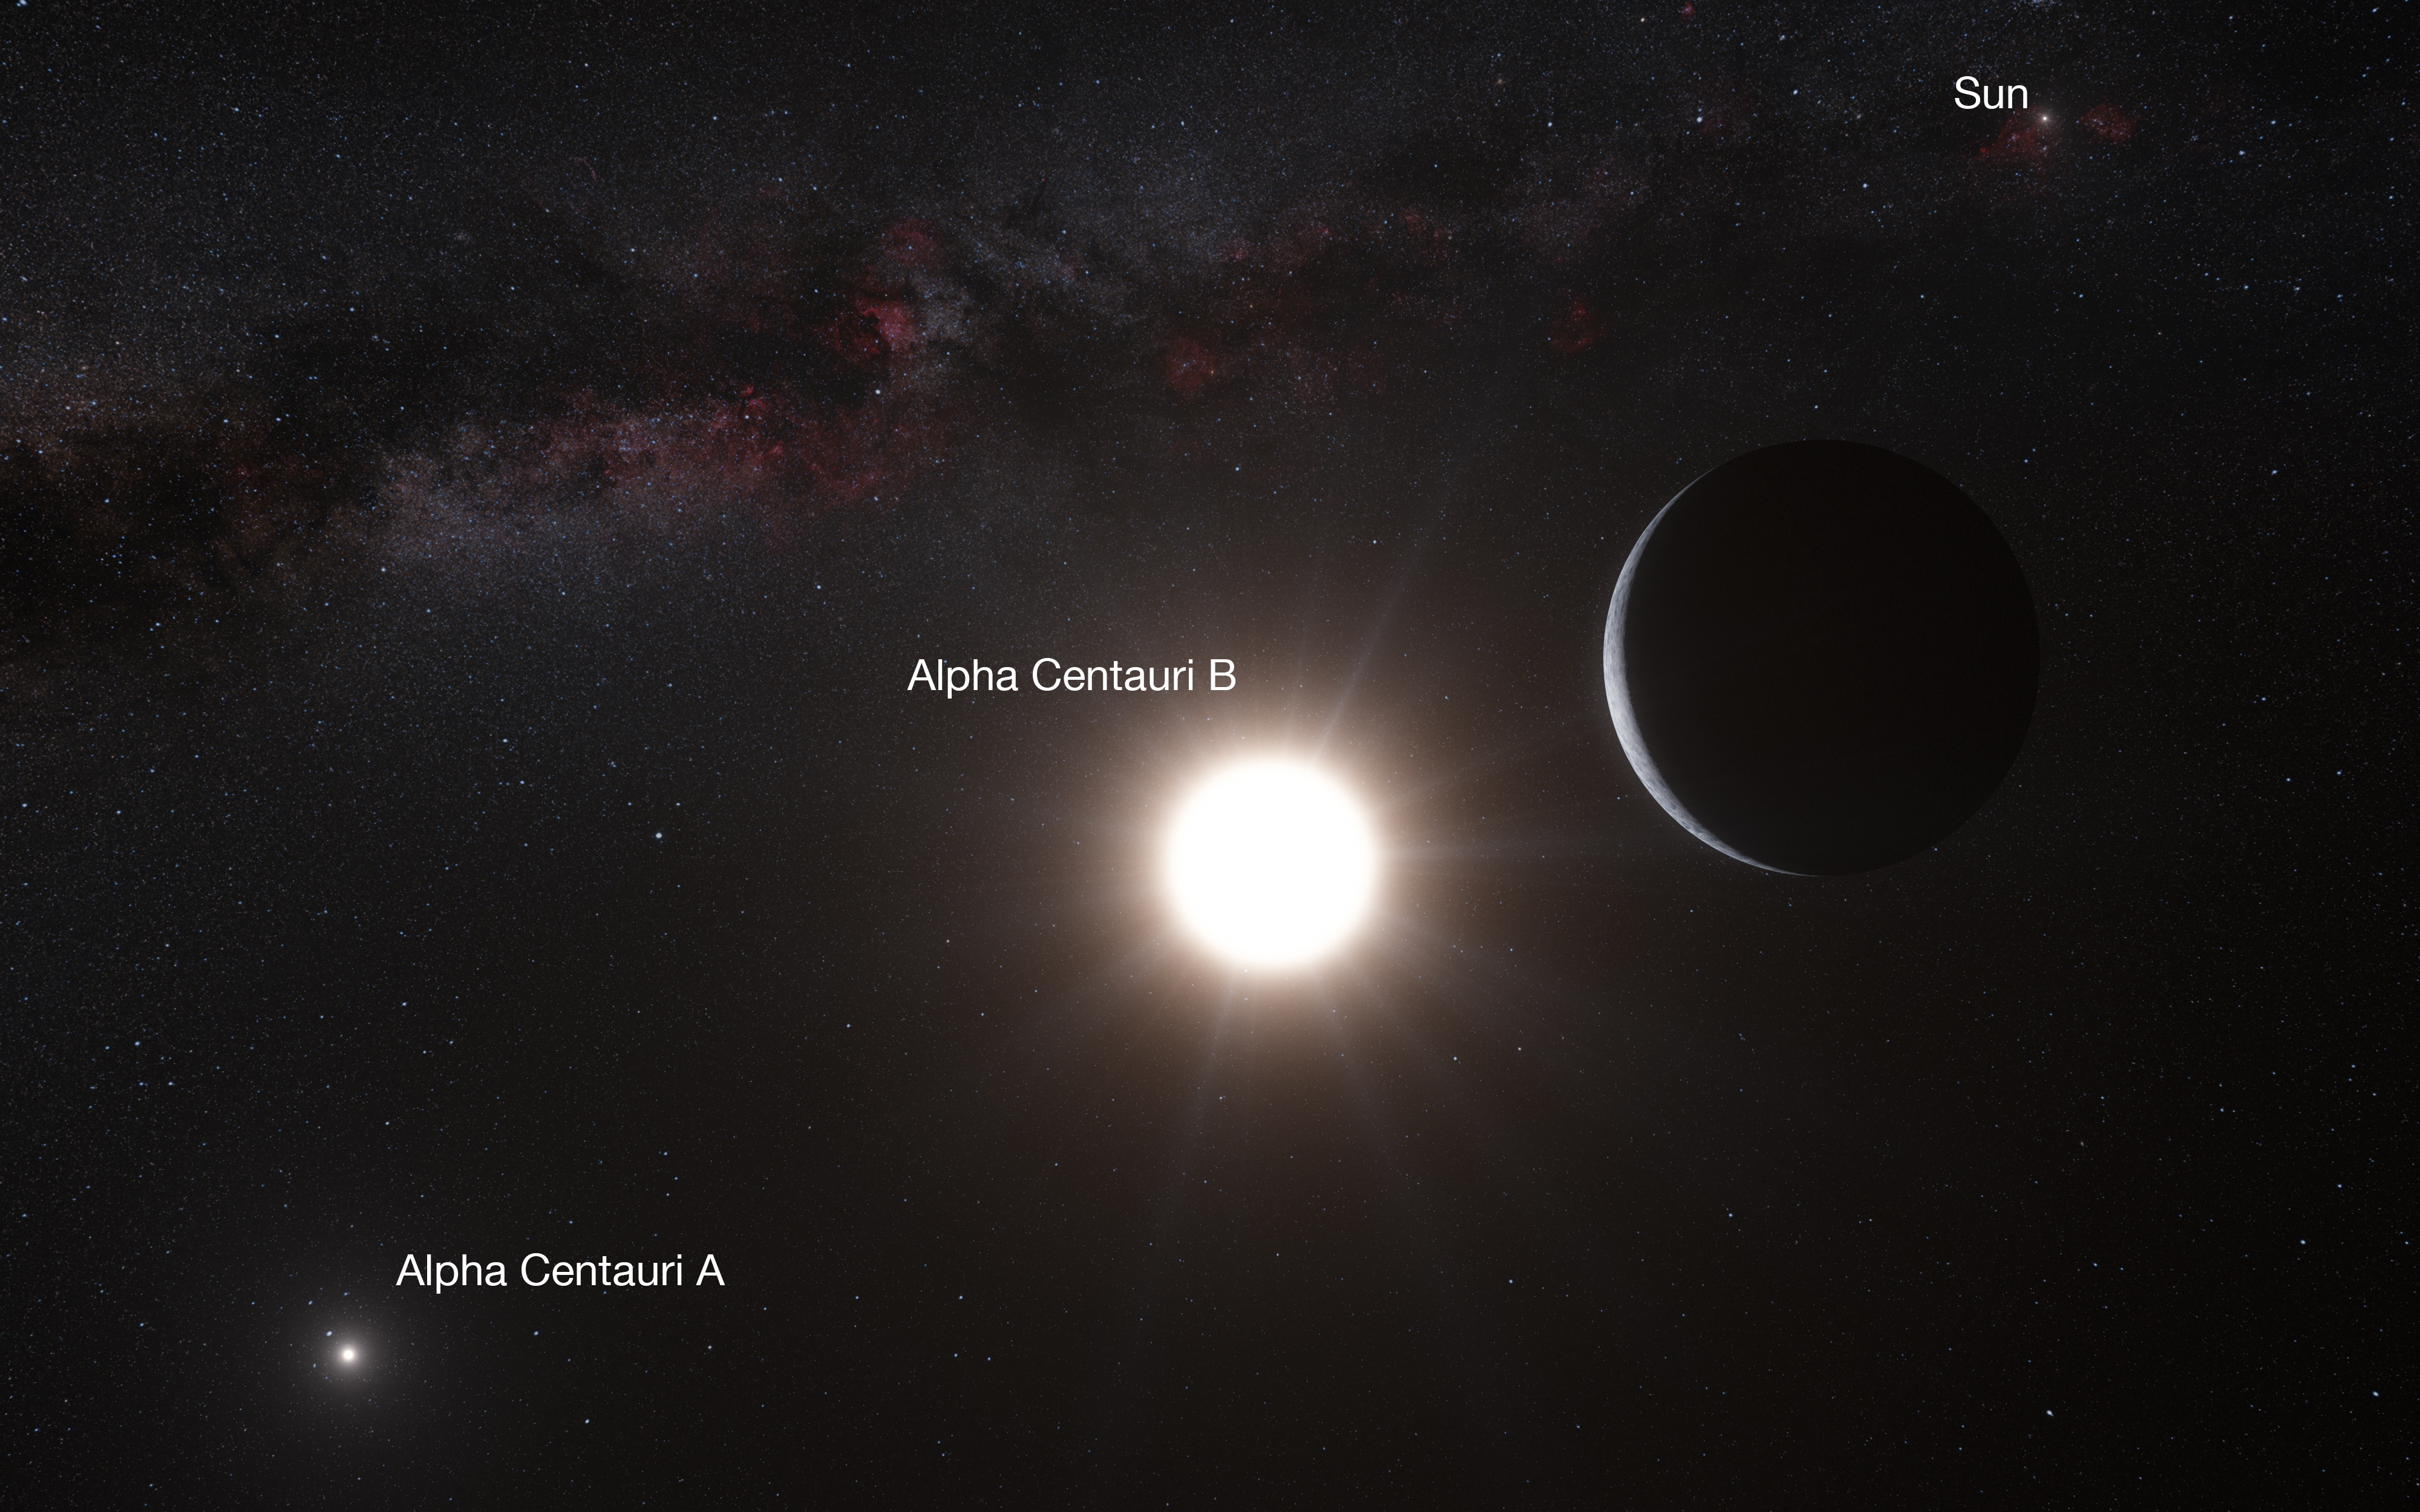 Alpha Centauri in fiction - Wikipedia